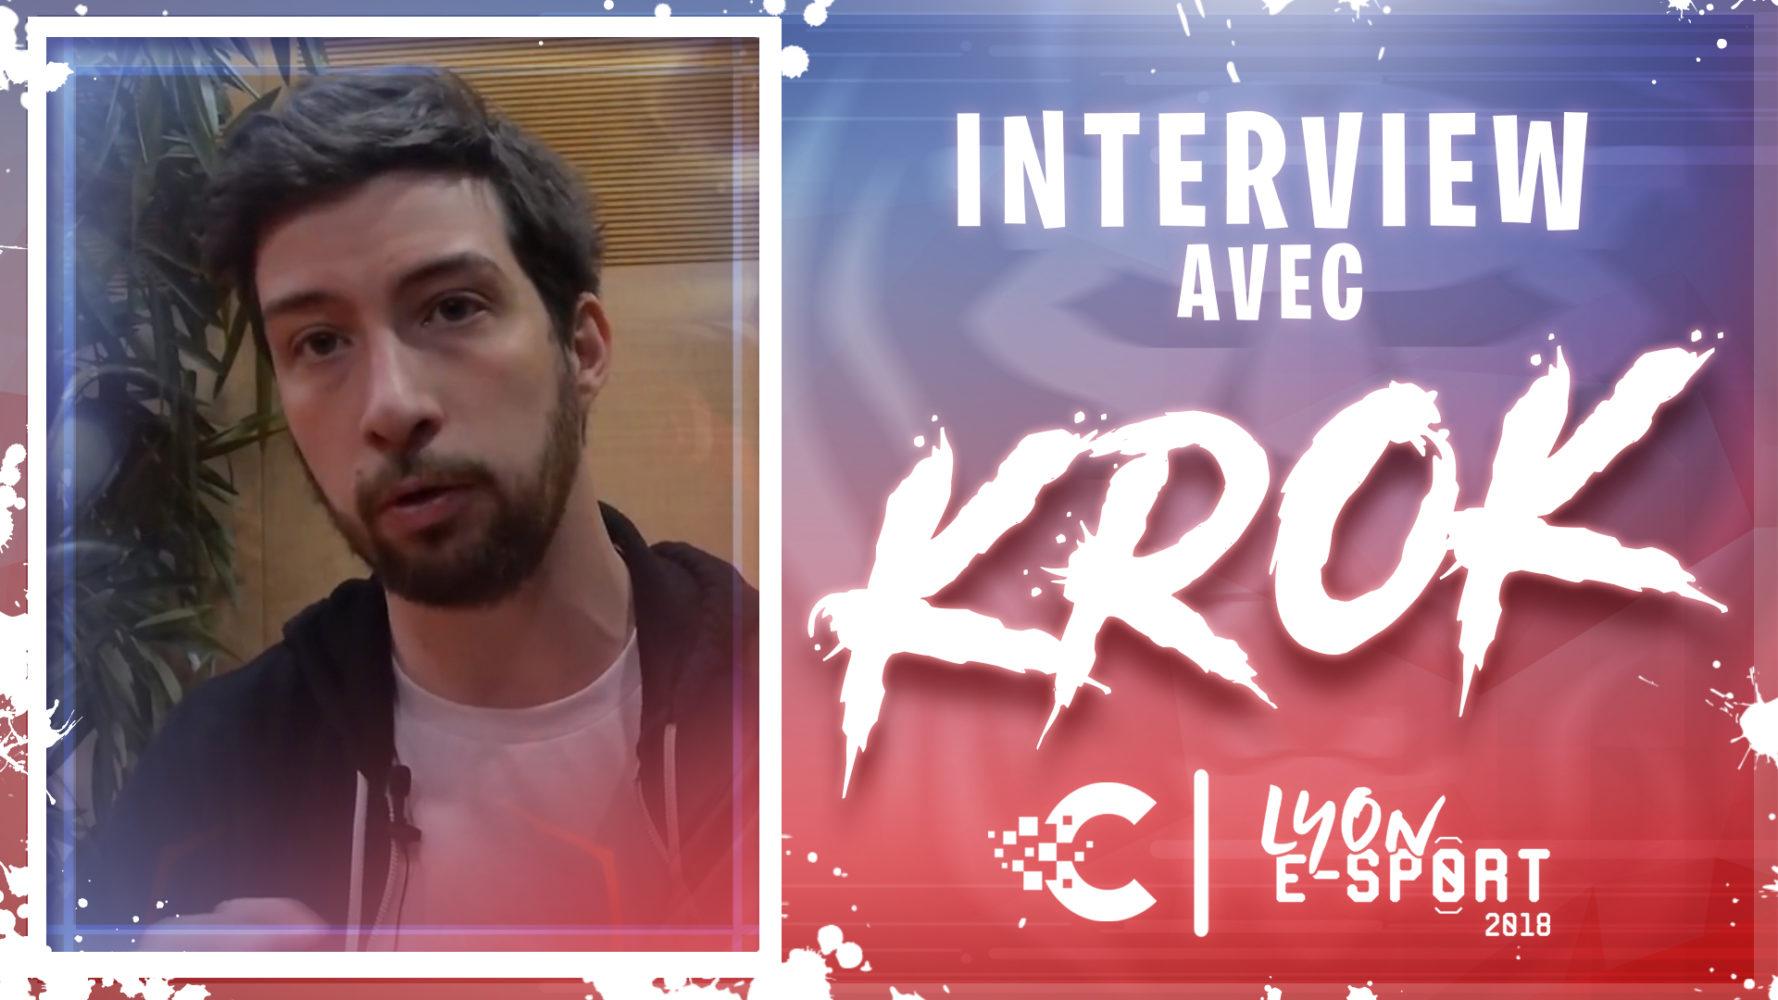 interview de krok